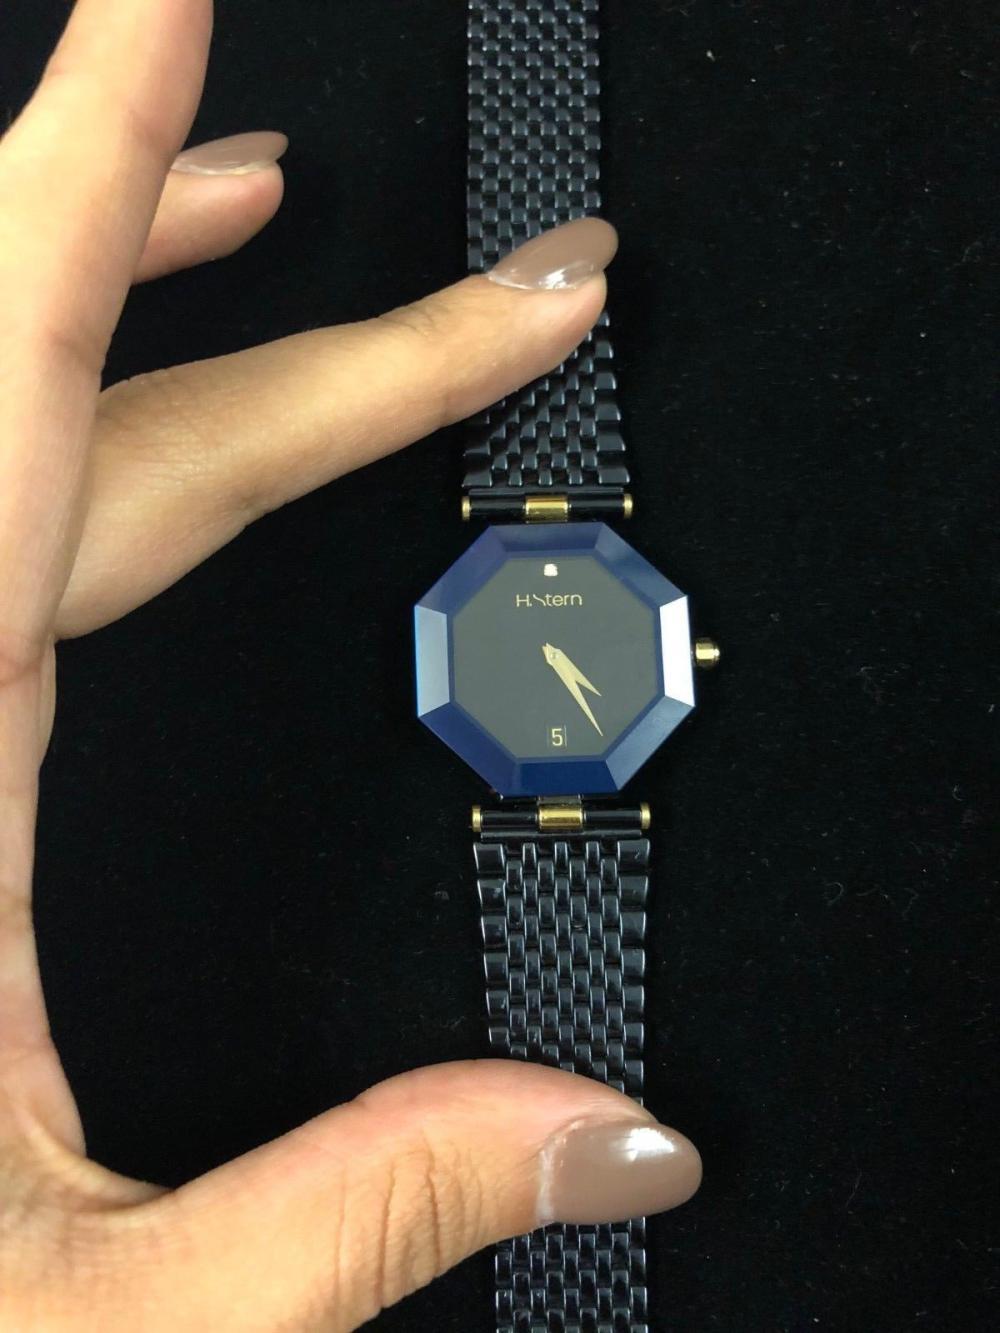 efc2aed8c H Stern Unisex Watch Octagon Shape w/ diamond SS Blue Sapphire w/ COA $10